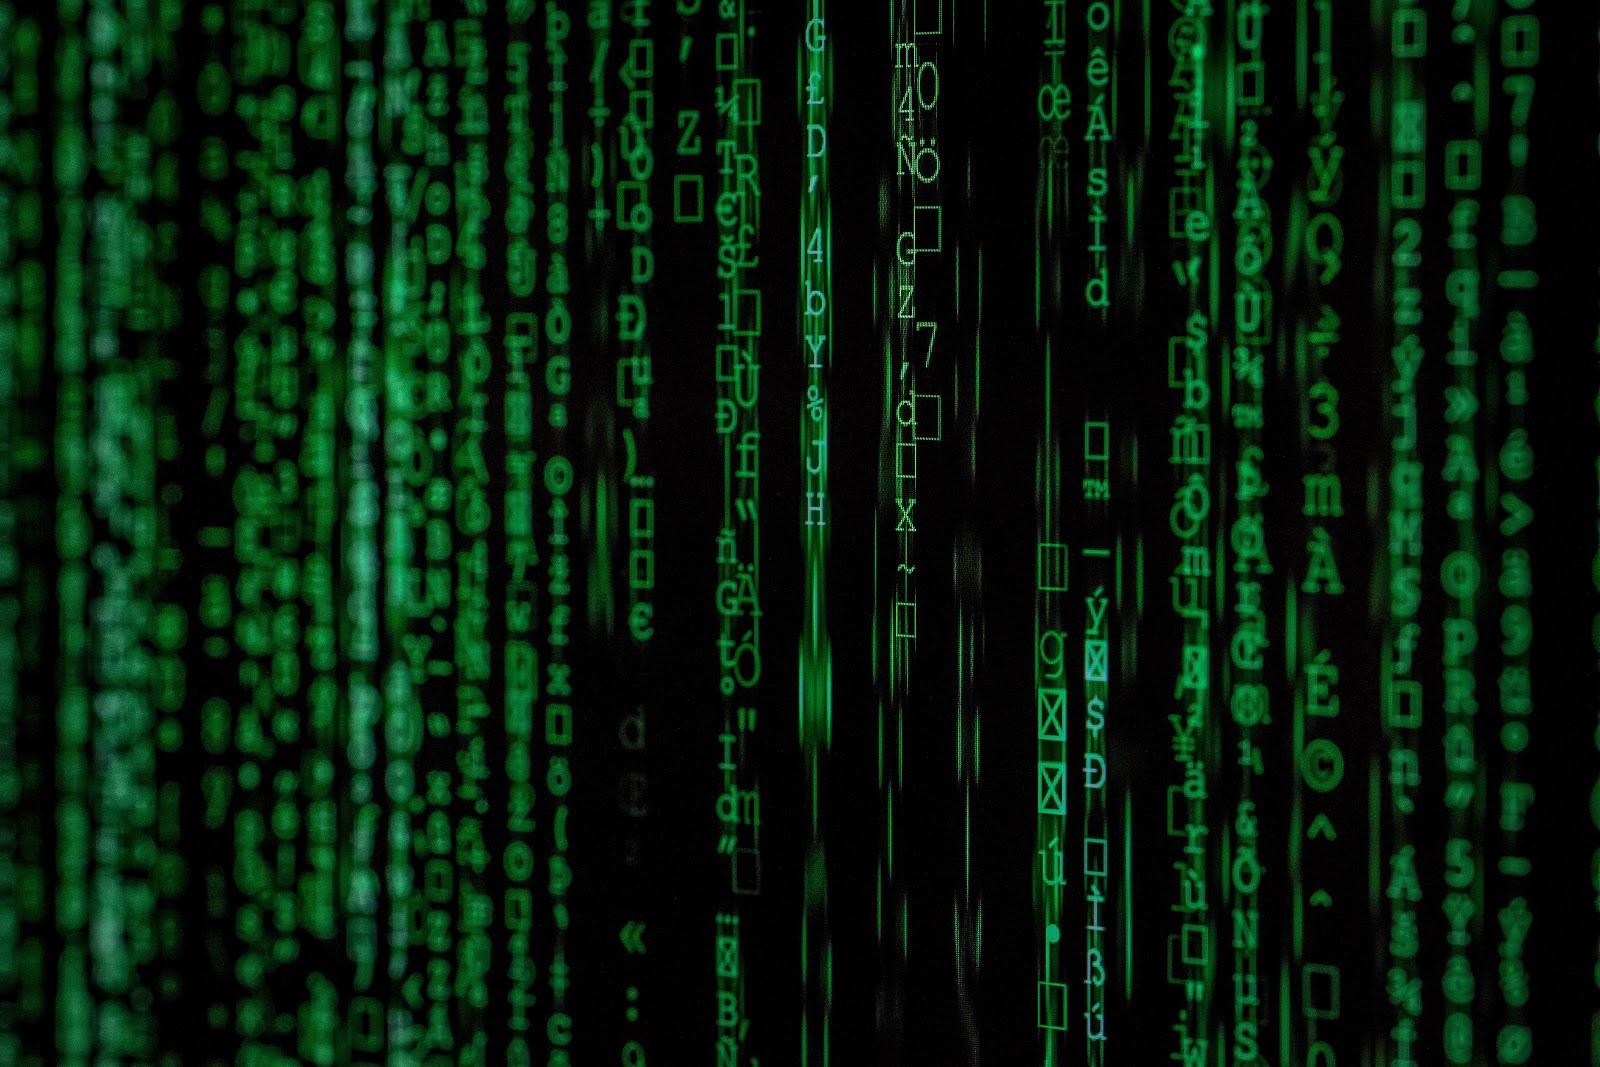 Green characters in a Matrix-like display